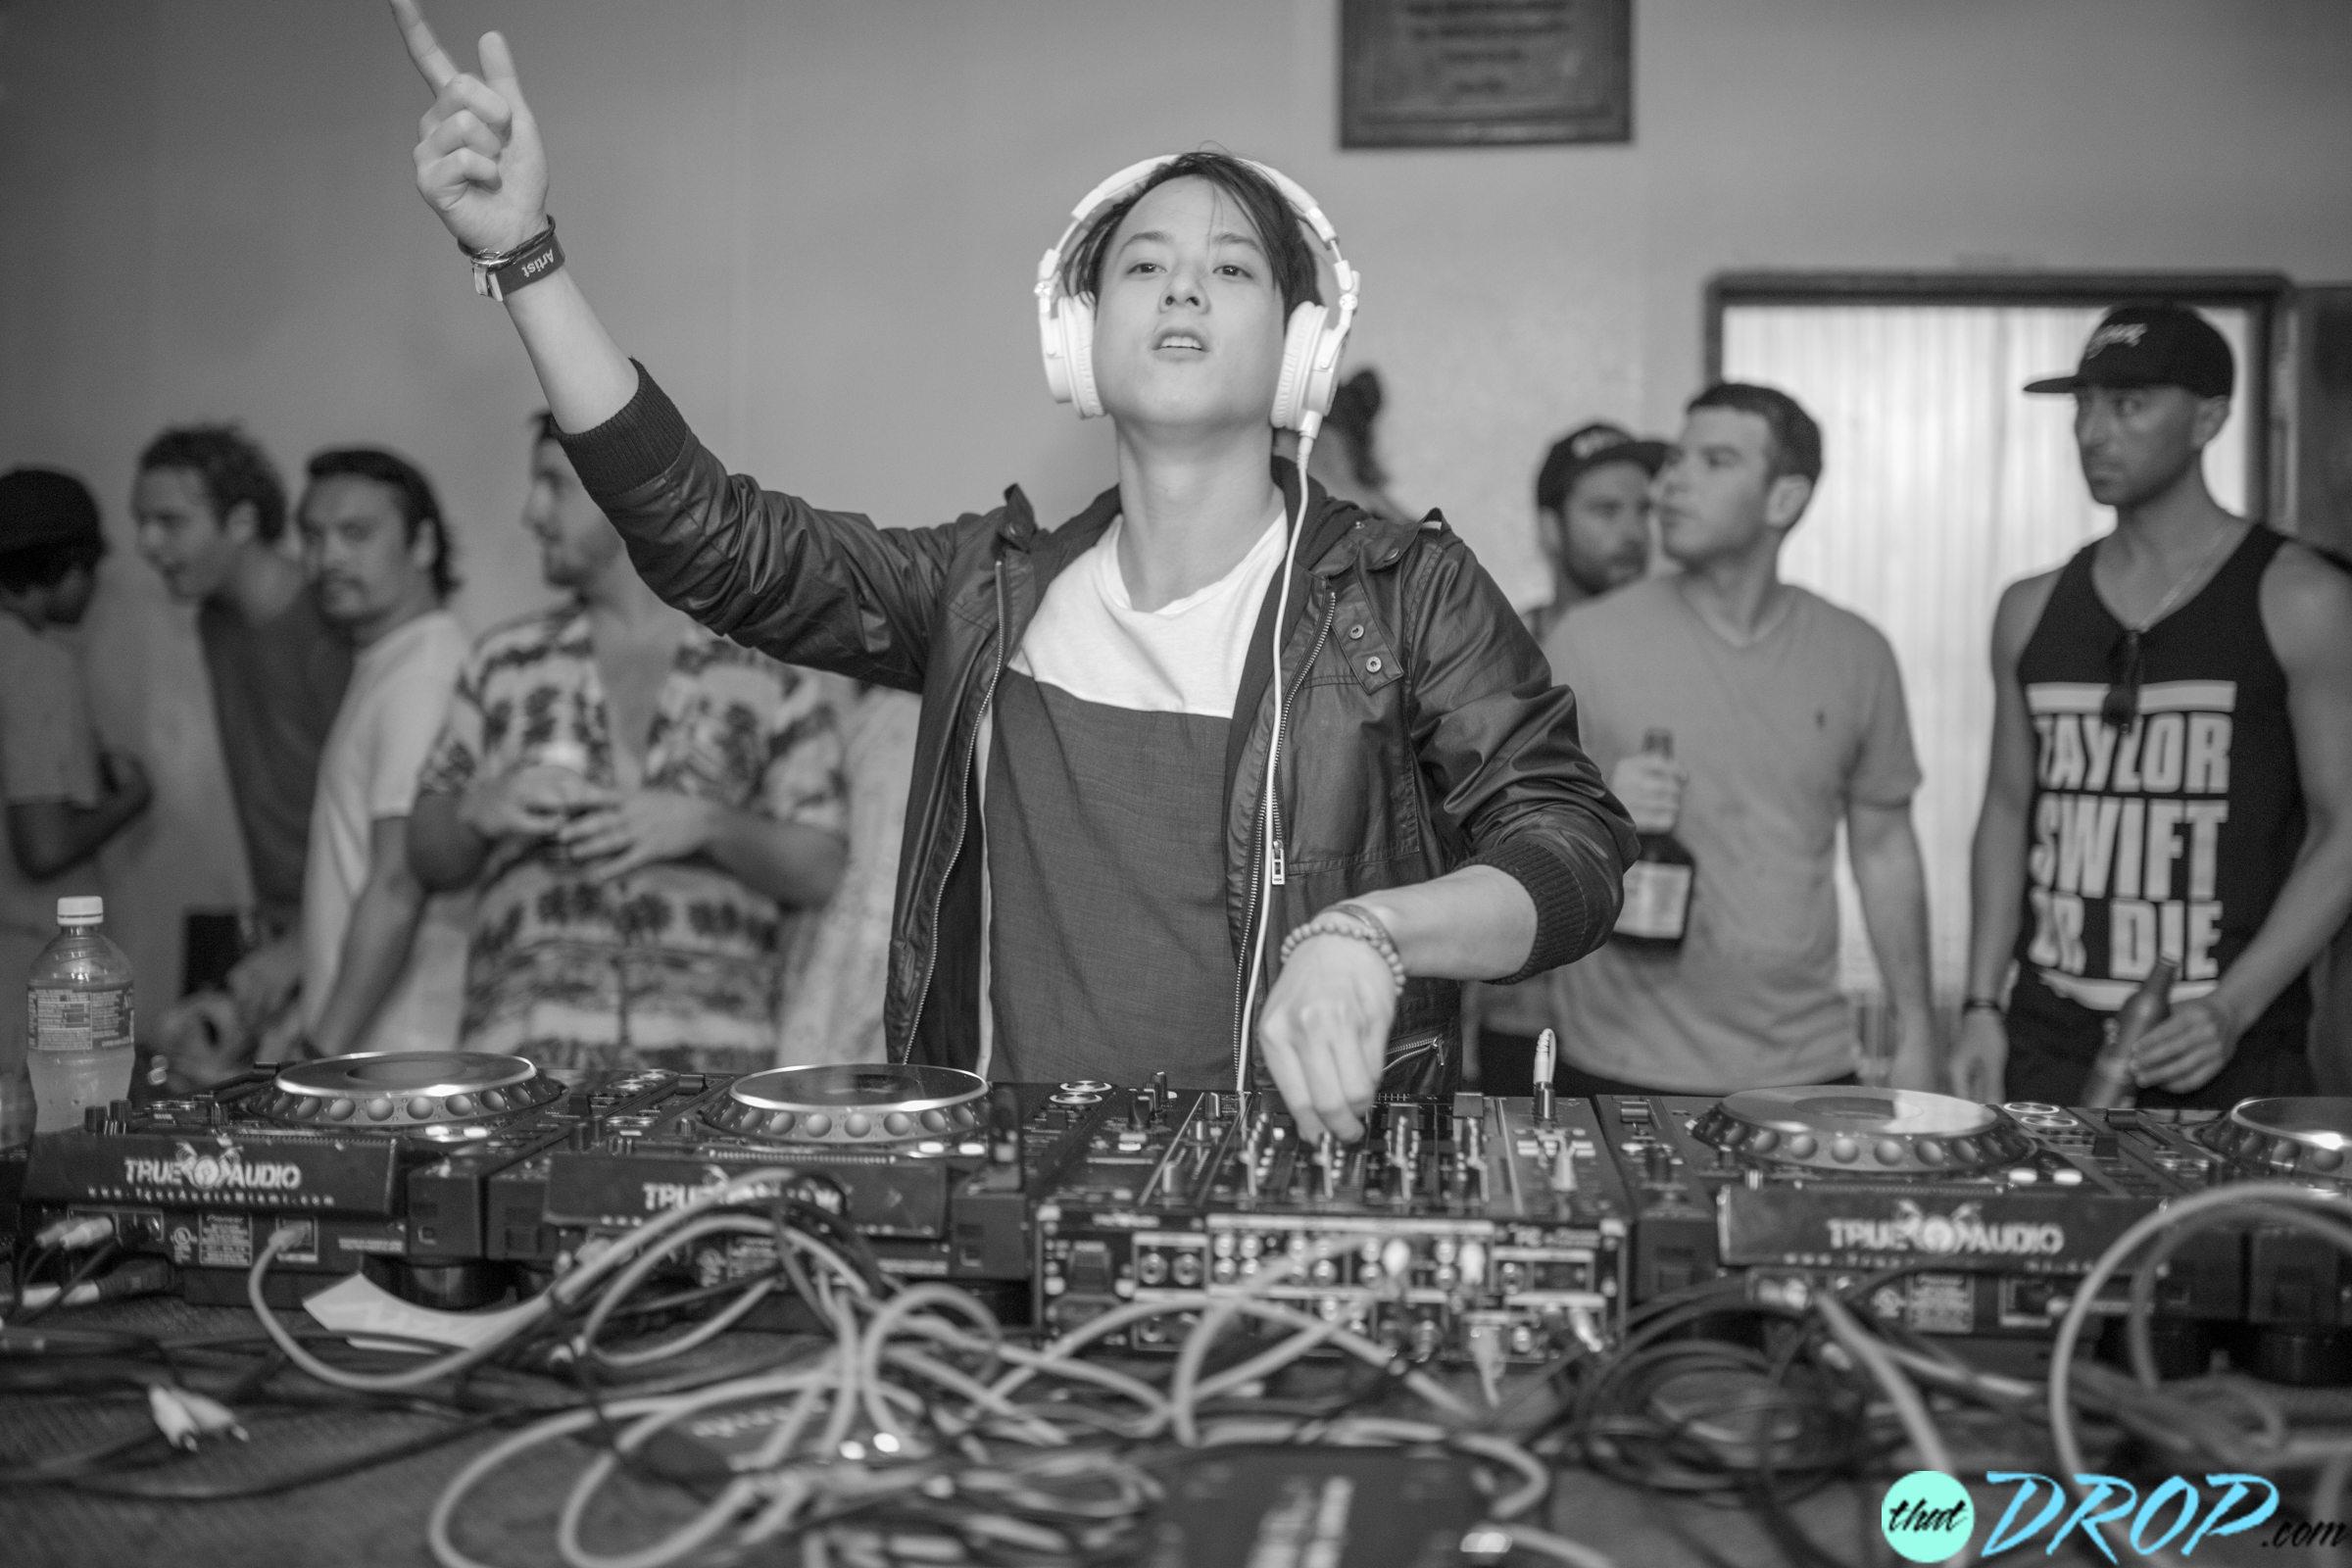 DJ Elephante Jolts the Crowd